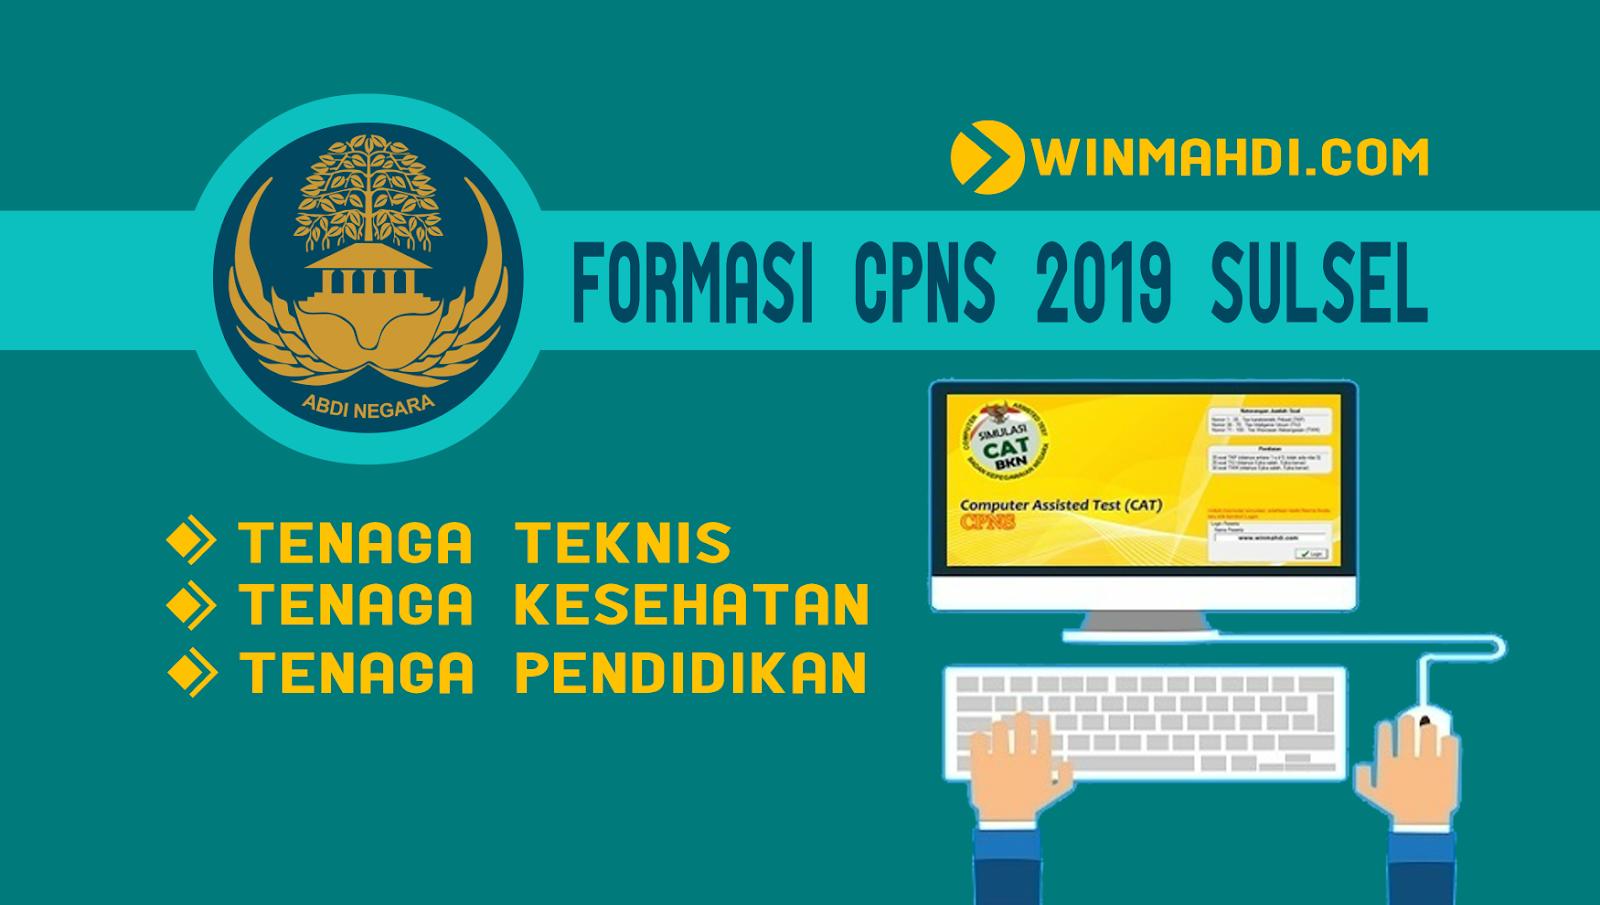 Formasi CPNS 2019 SULSEL